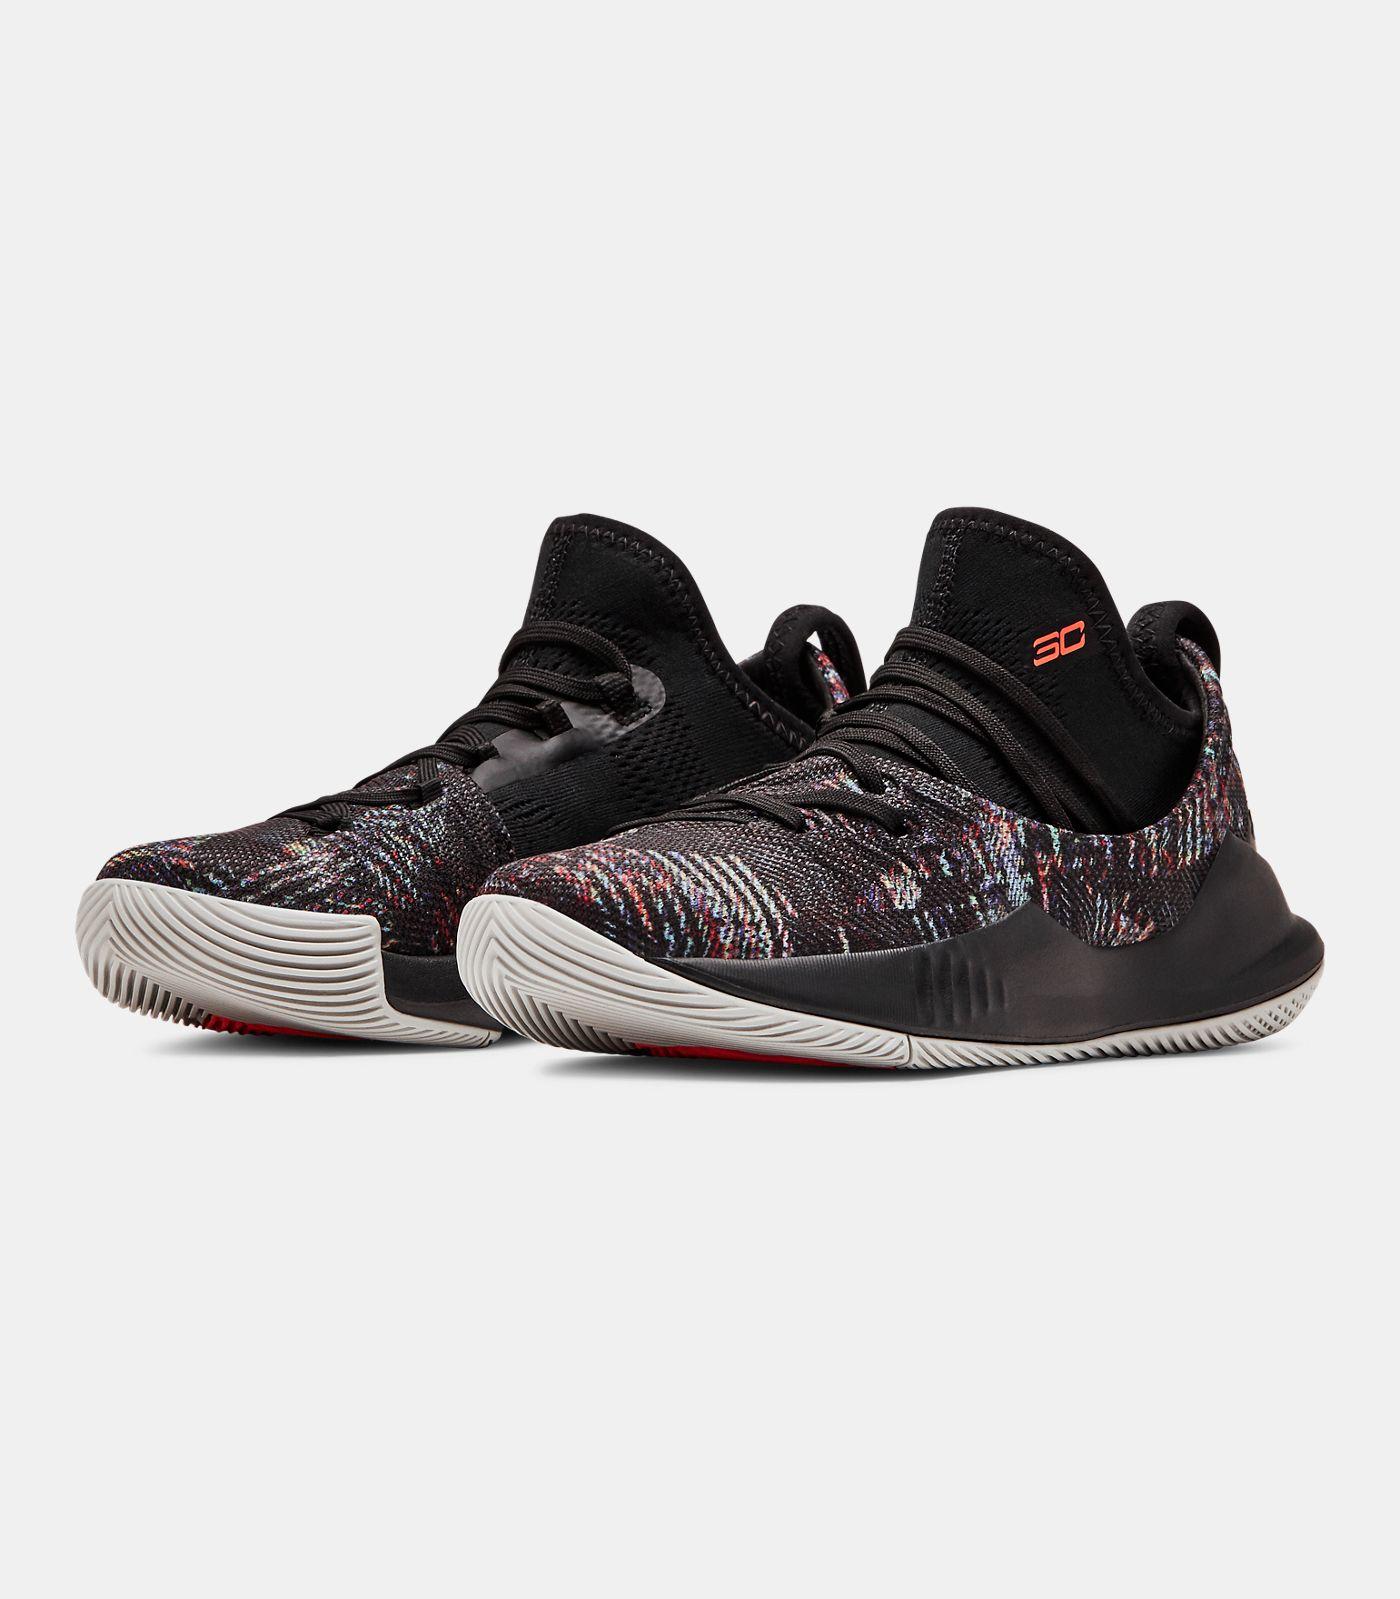 Pre-School UA Curry 5 Basketball Shoes, Black , , Black